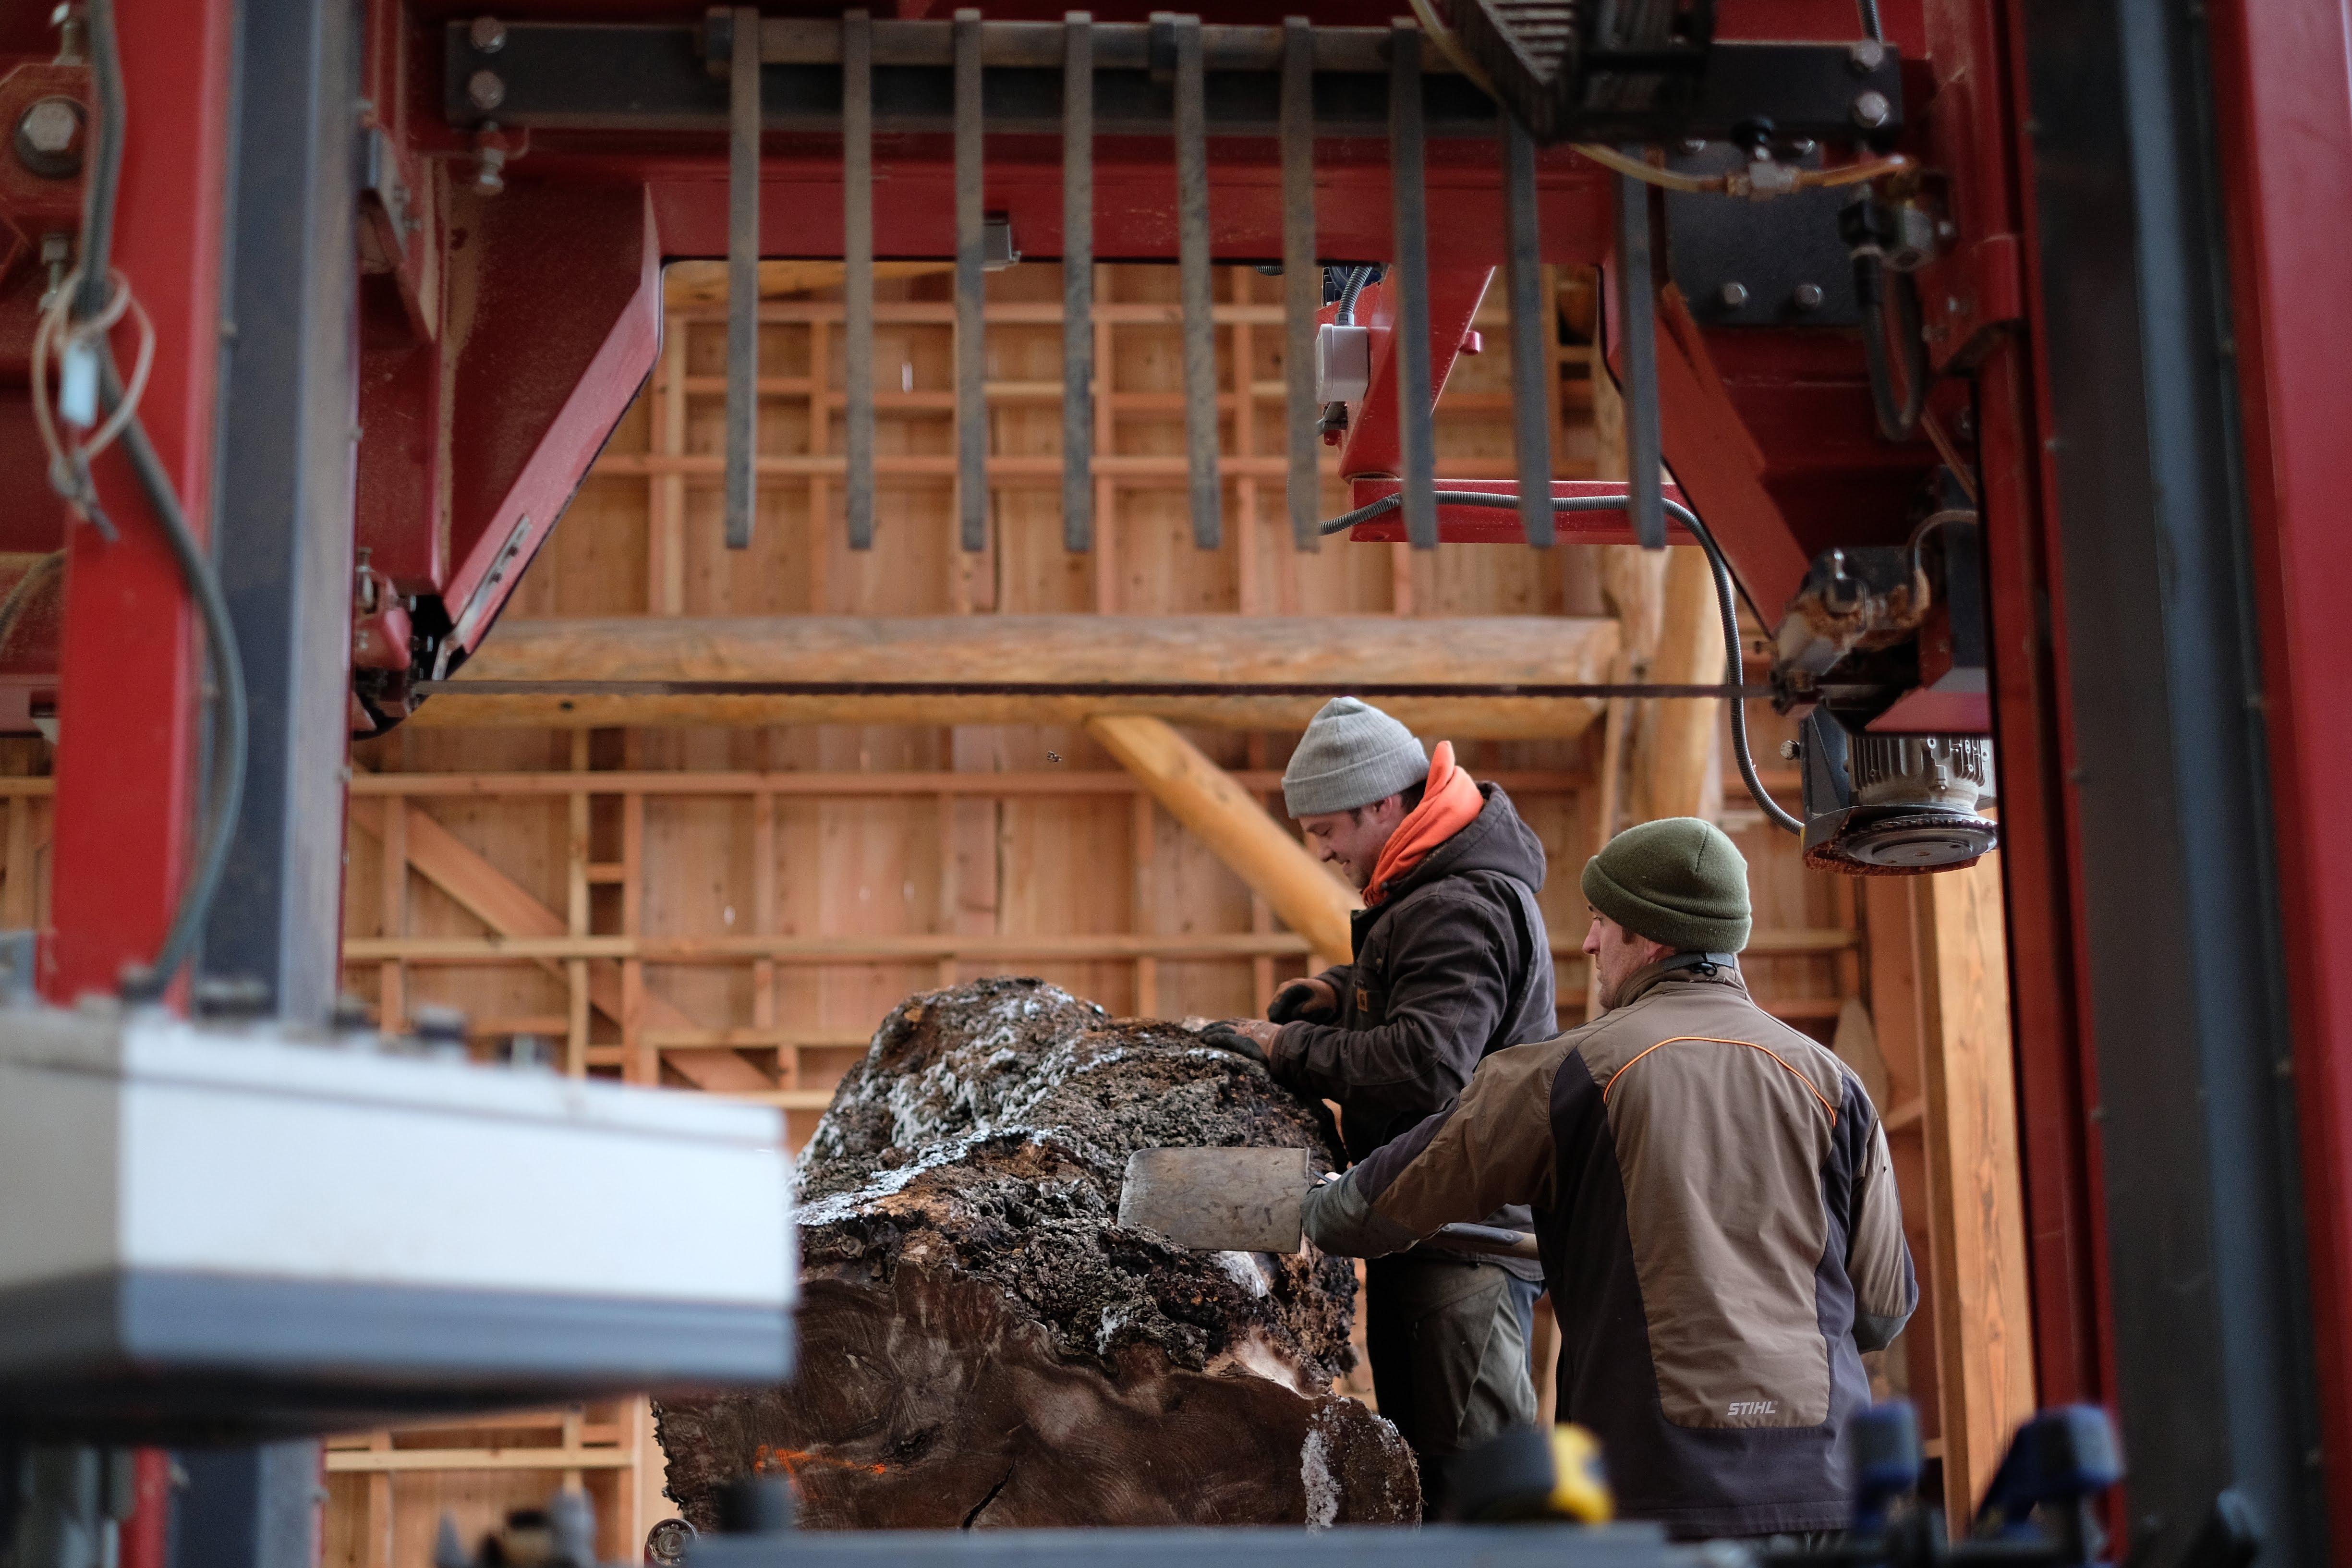 Logie TImber sawmill